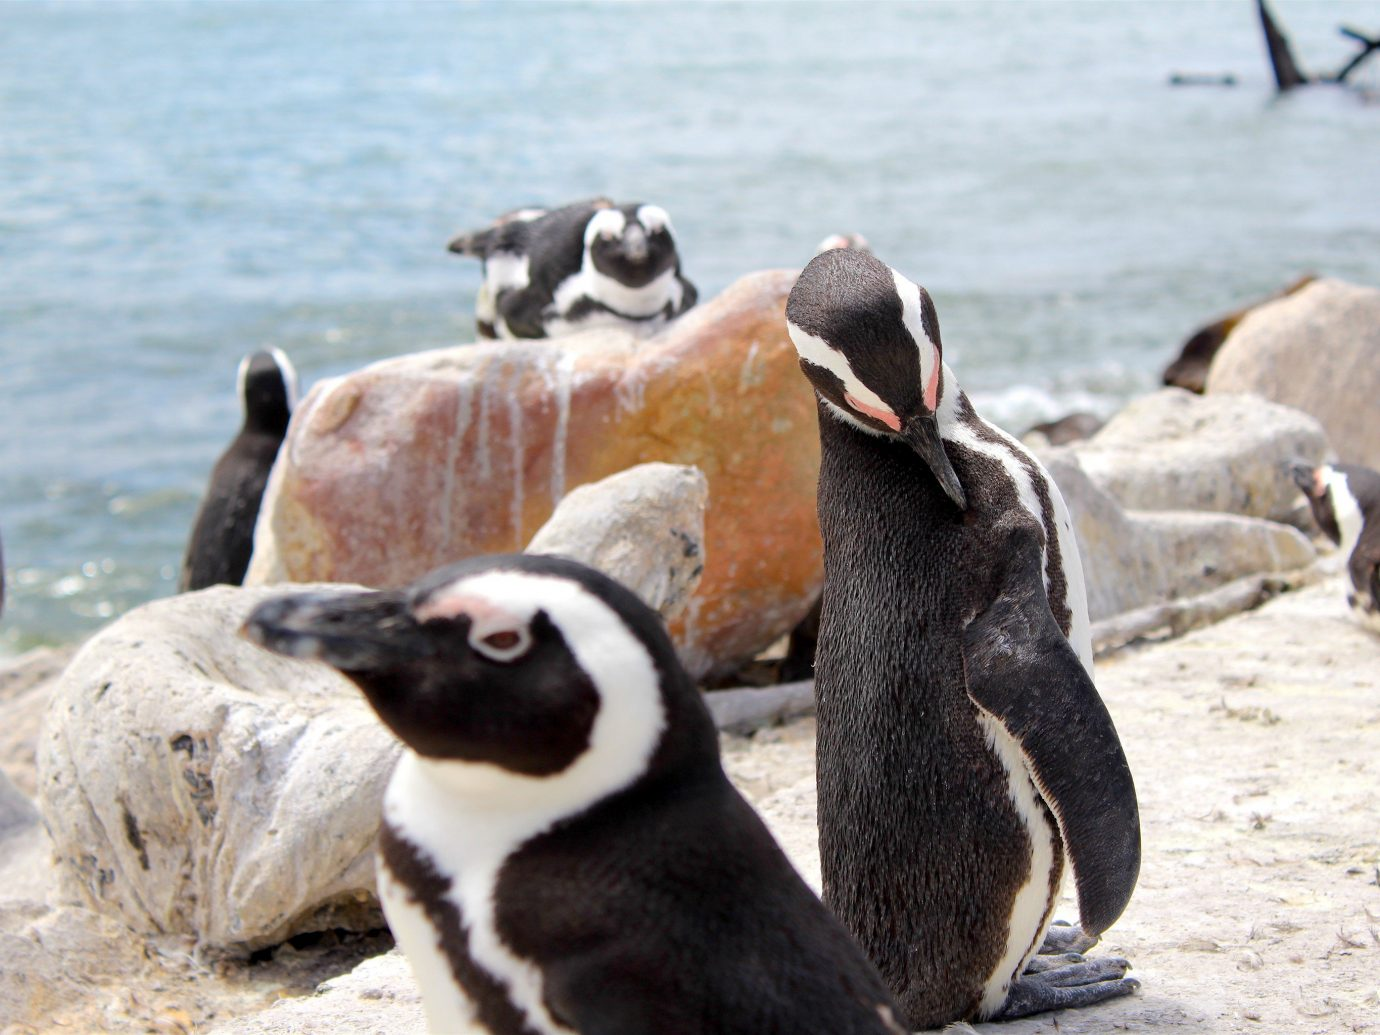 Outdoors + Adventure Safaris Trip Ideas water outdoor animal penguin flightless bird Bird aquatic bird vertebrate fauna Wildlife black zoo